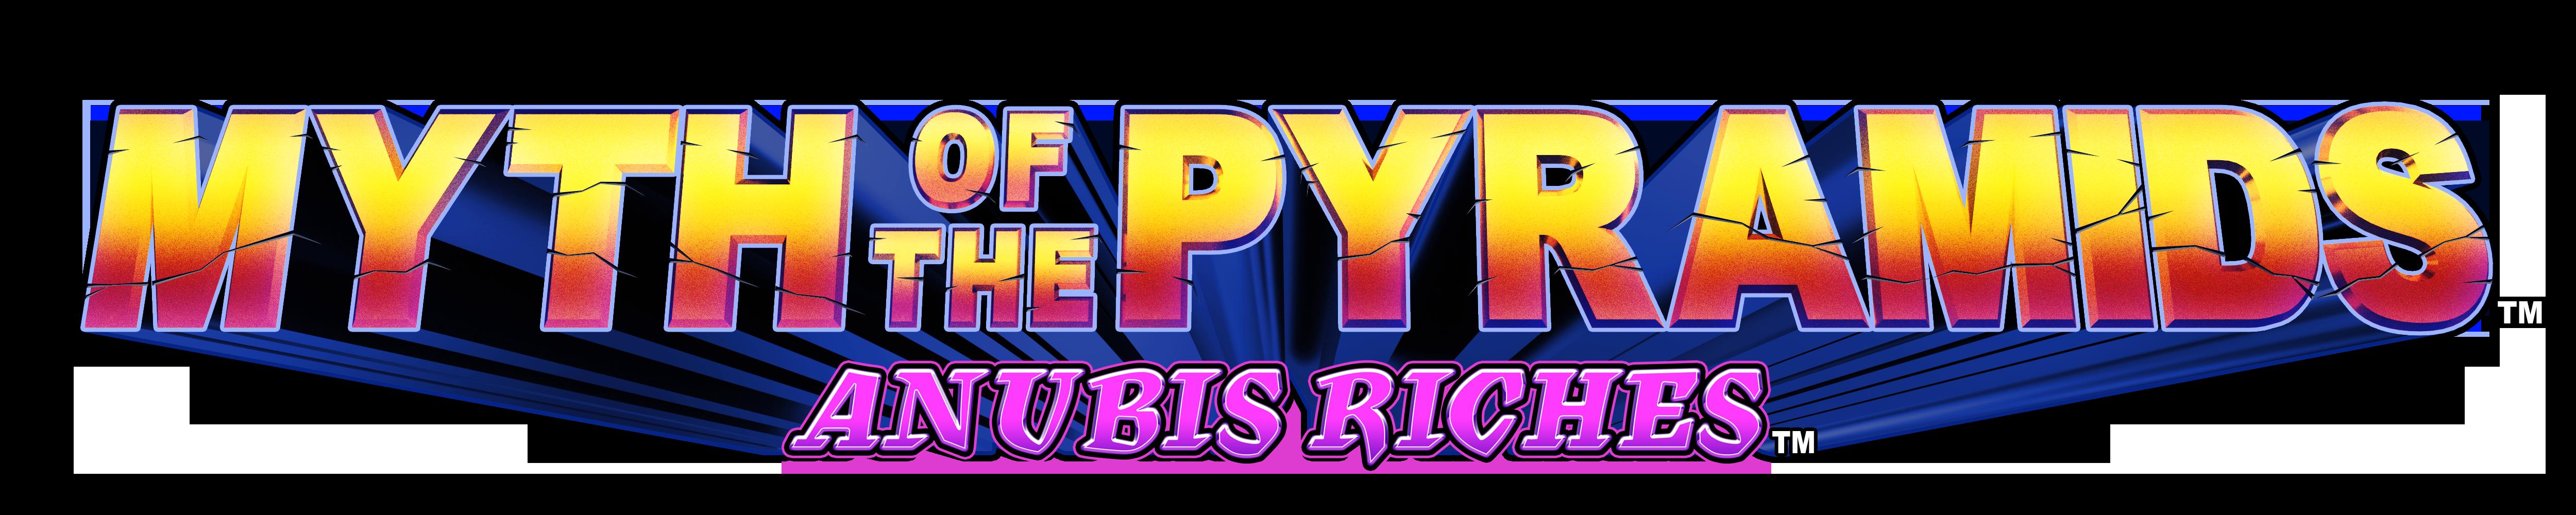 Myth of the Pyramids Anubis Riches Logo